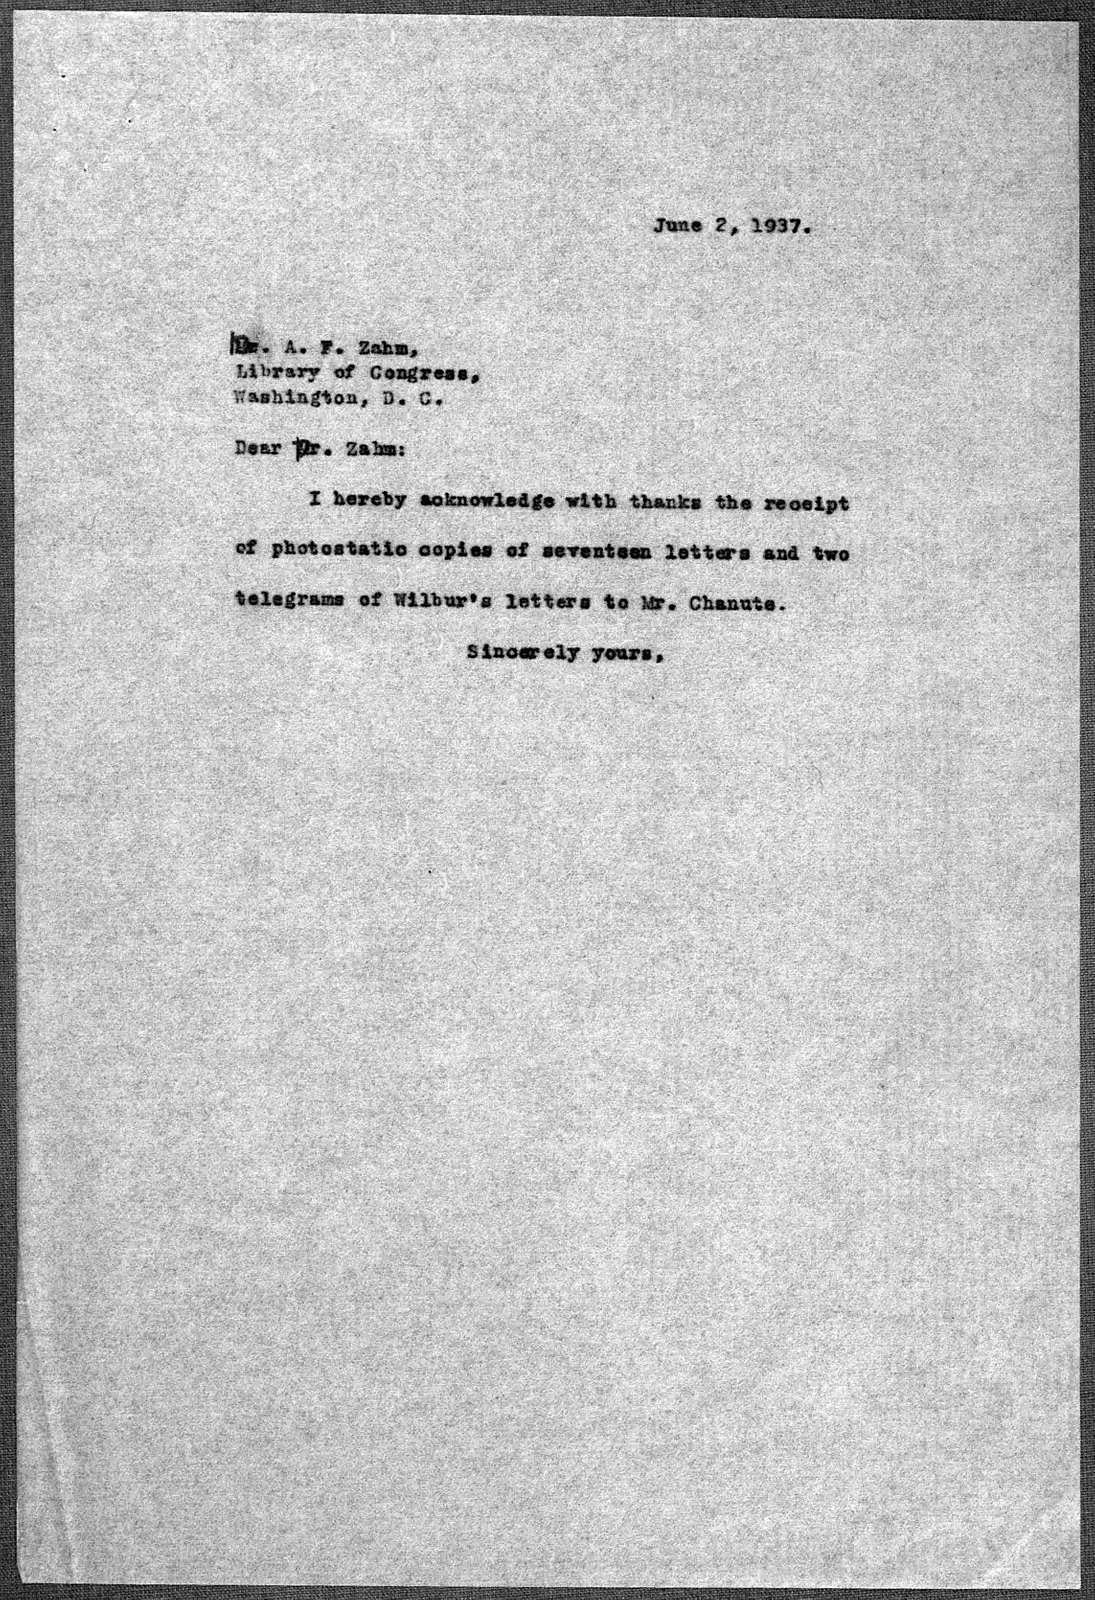 General Correspondence:  Zahm, Albert F., 1937-1943, undated